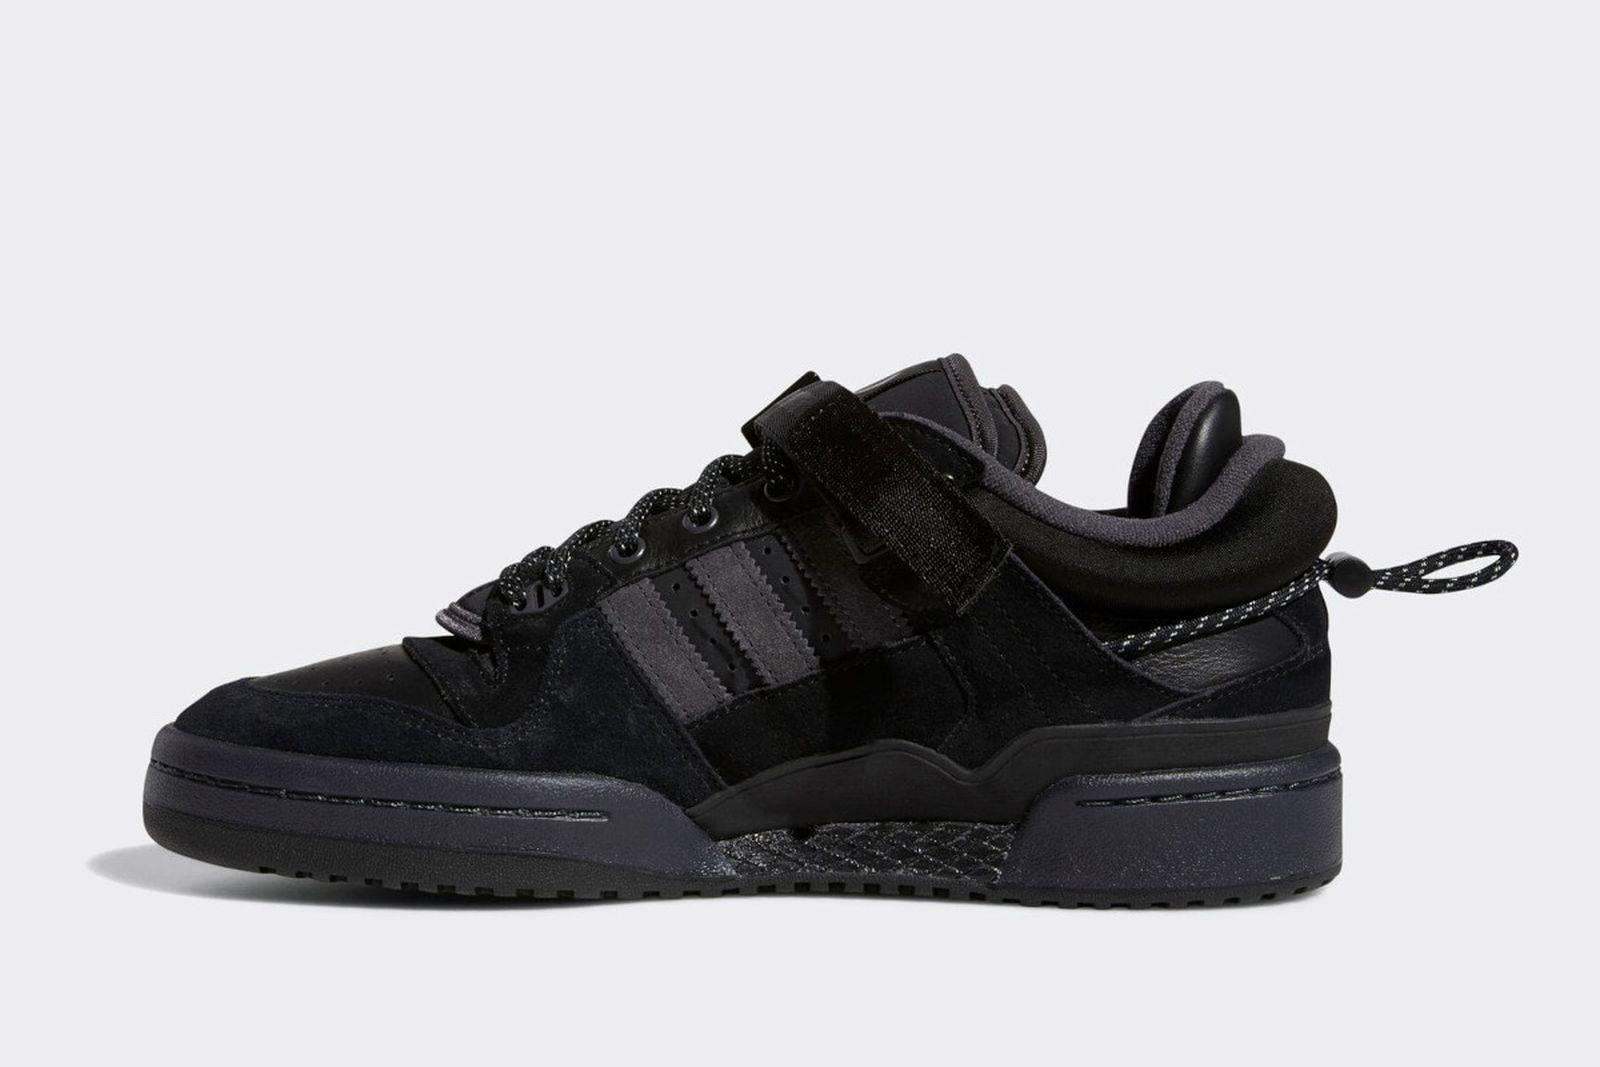 bad-bunny-adidas-originals-forum-low-triple-black-release-date-price-04